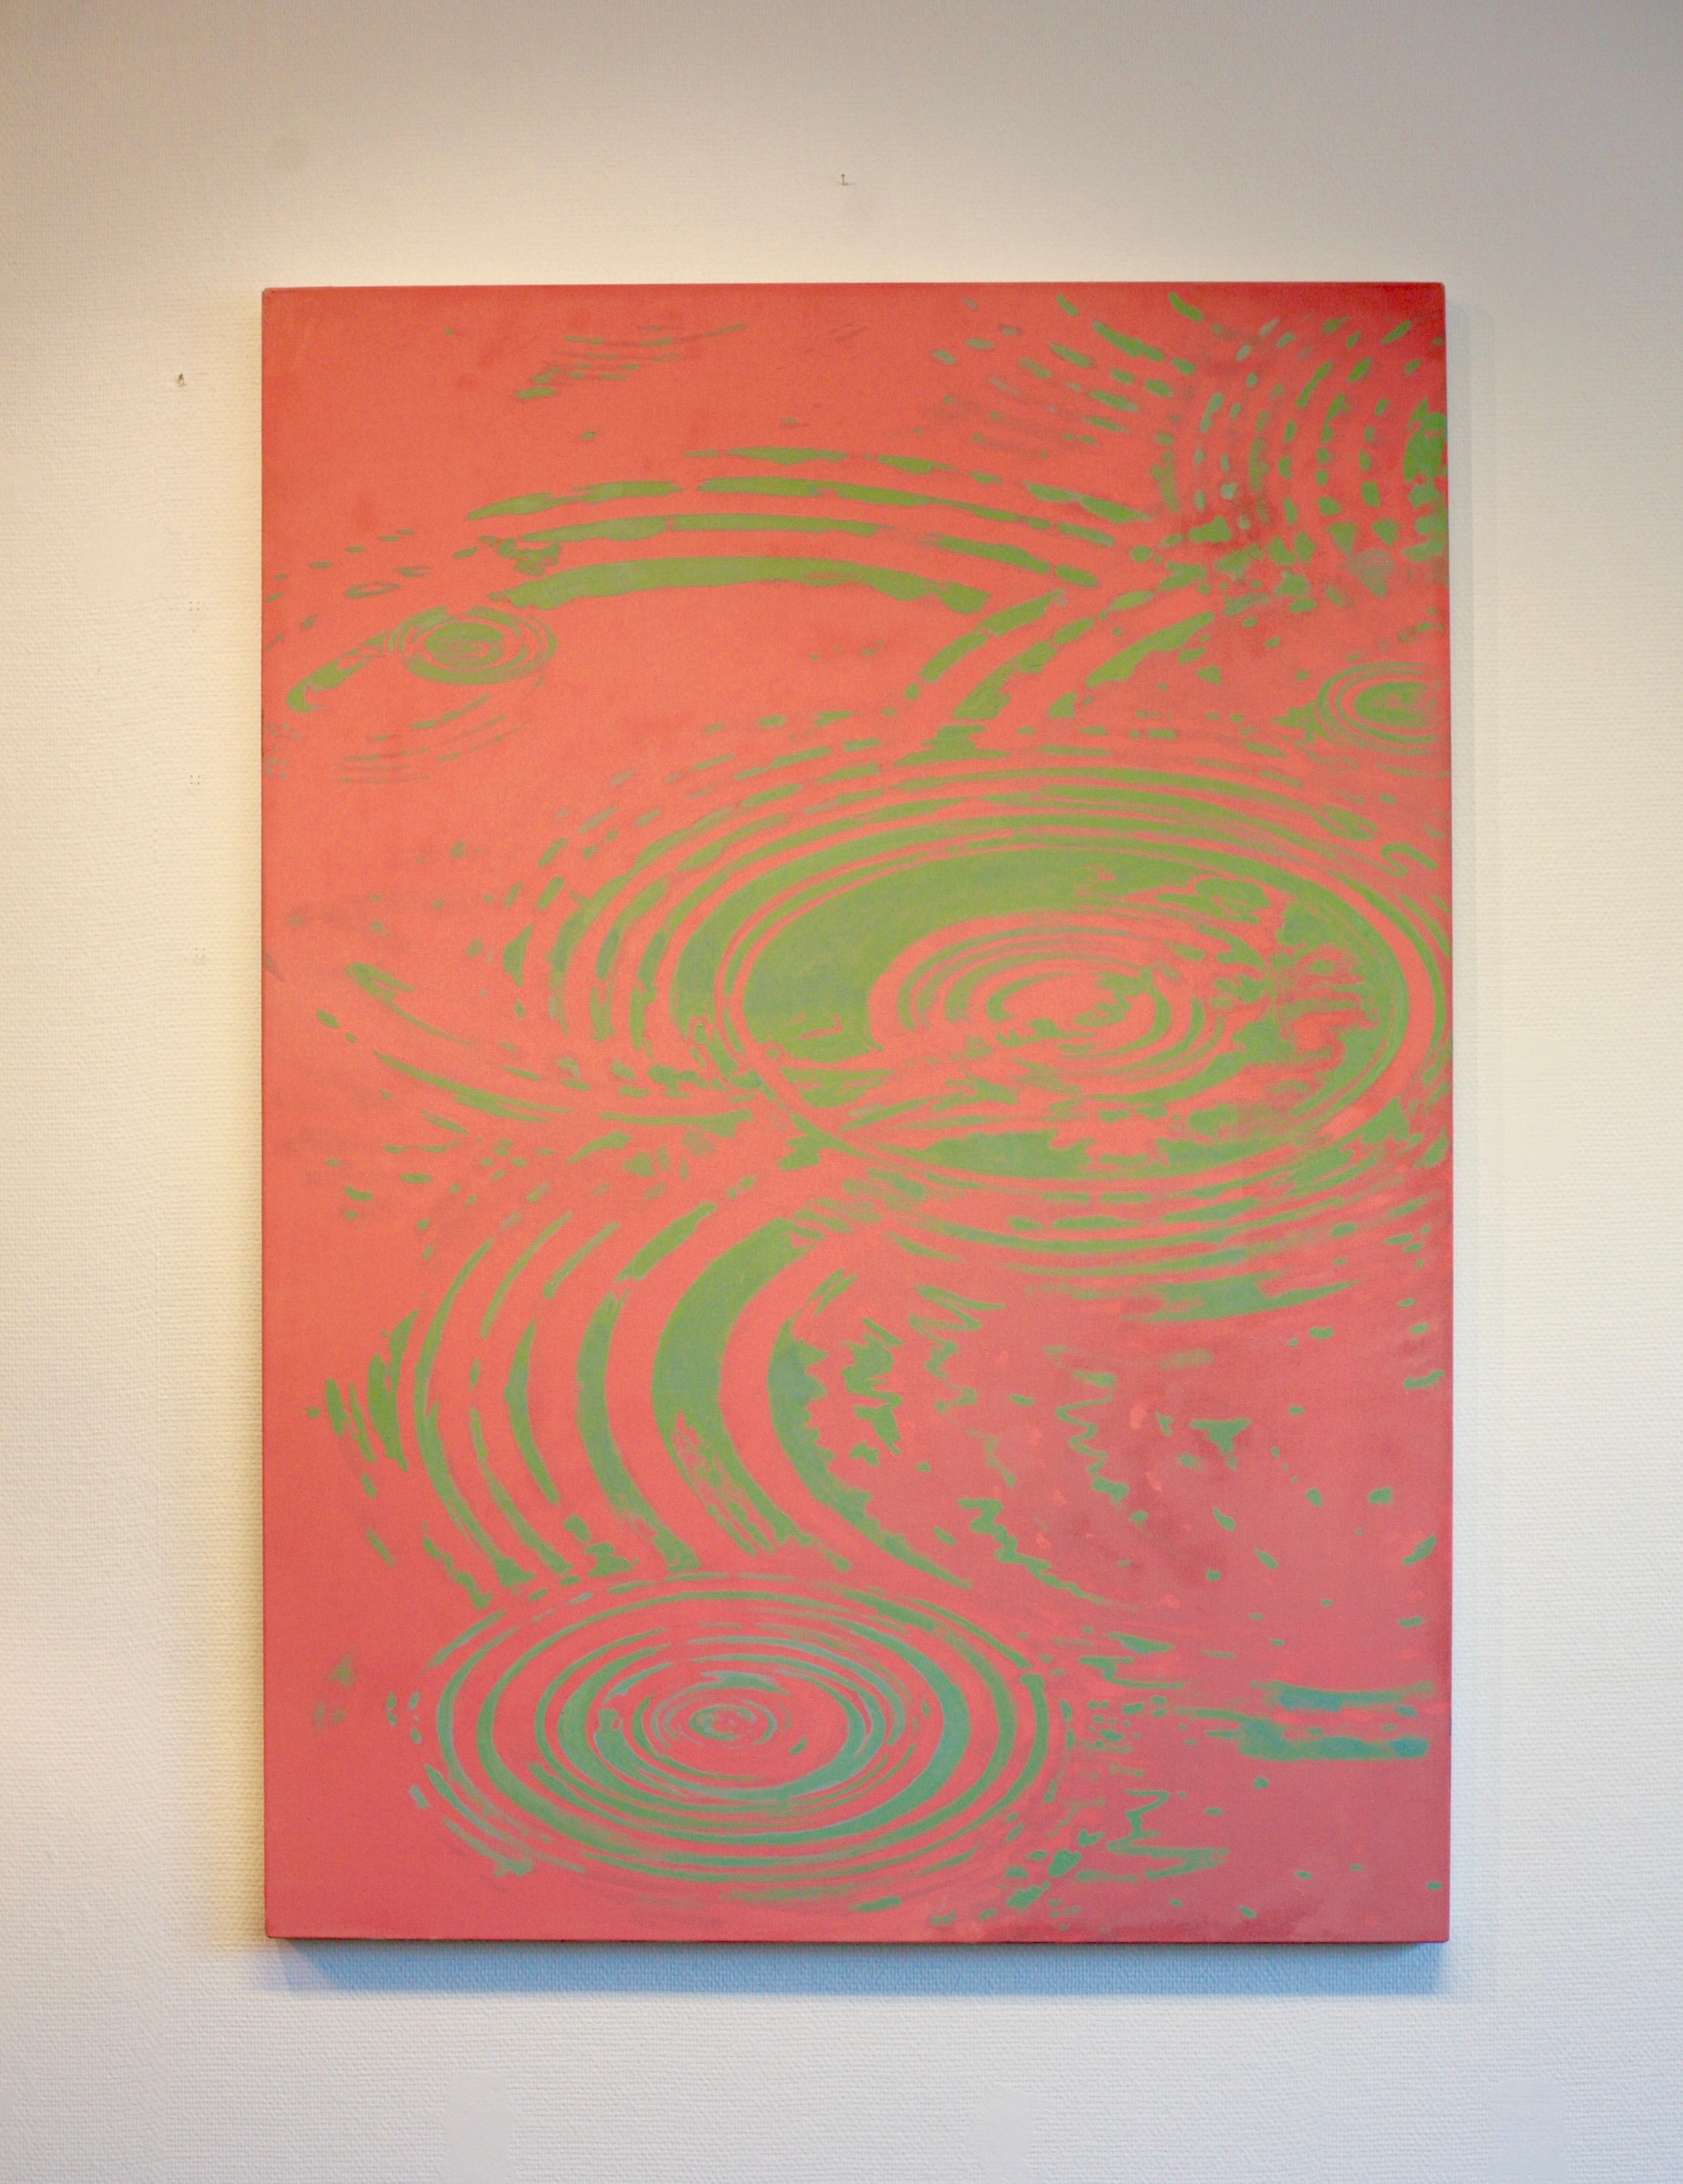 Joakim Allgulander - Cobolt swirl, acrylic on canvas